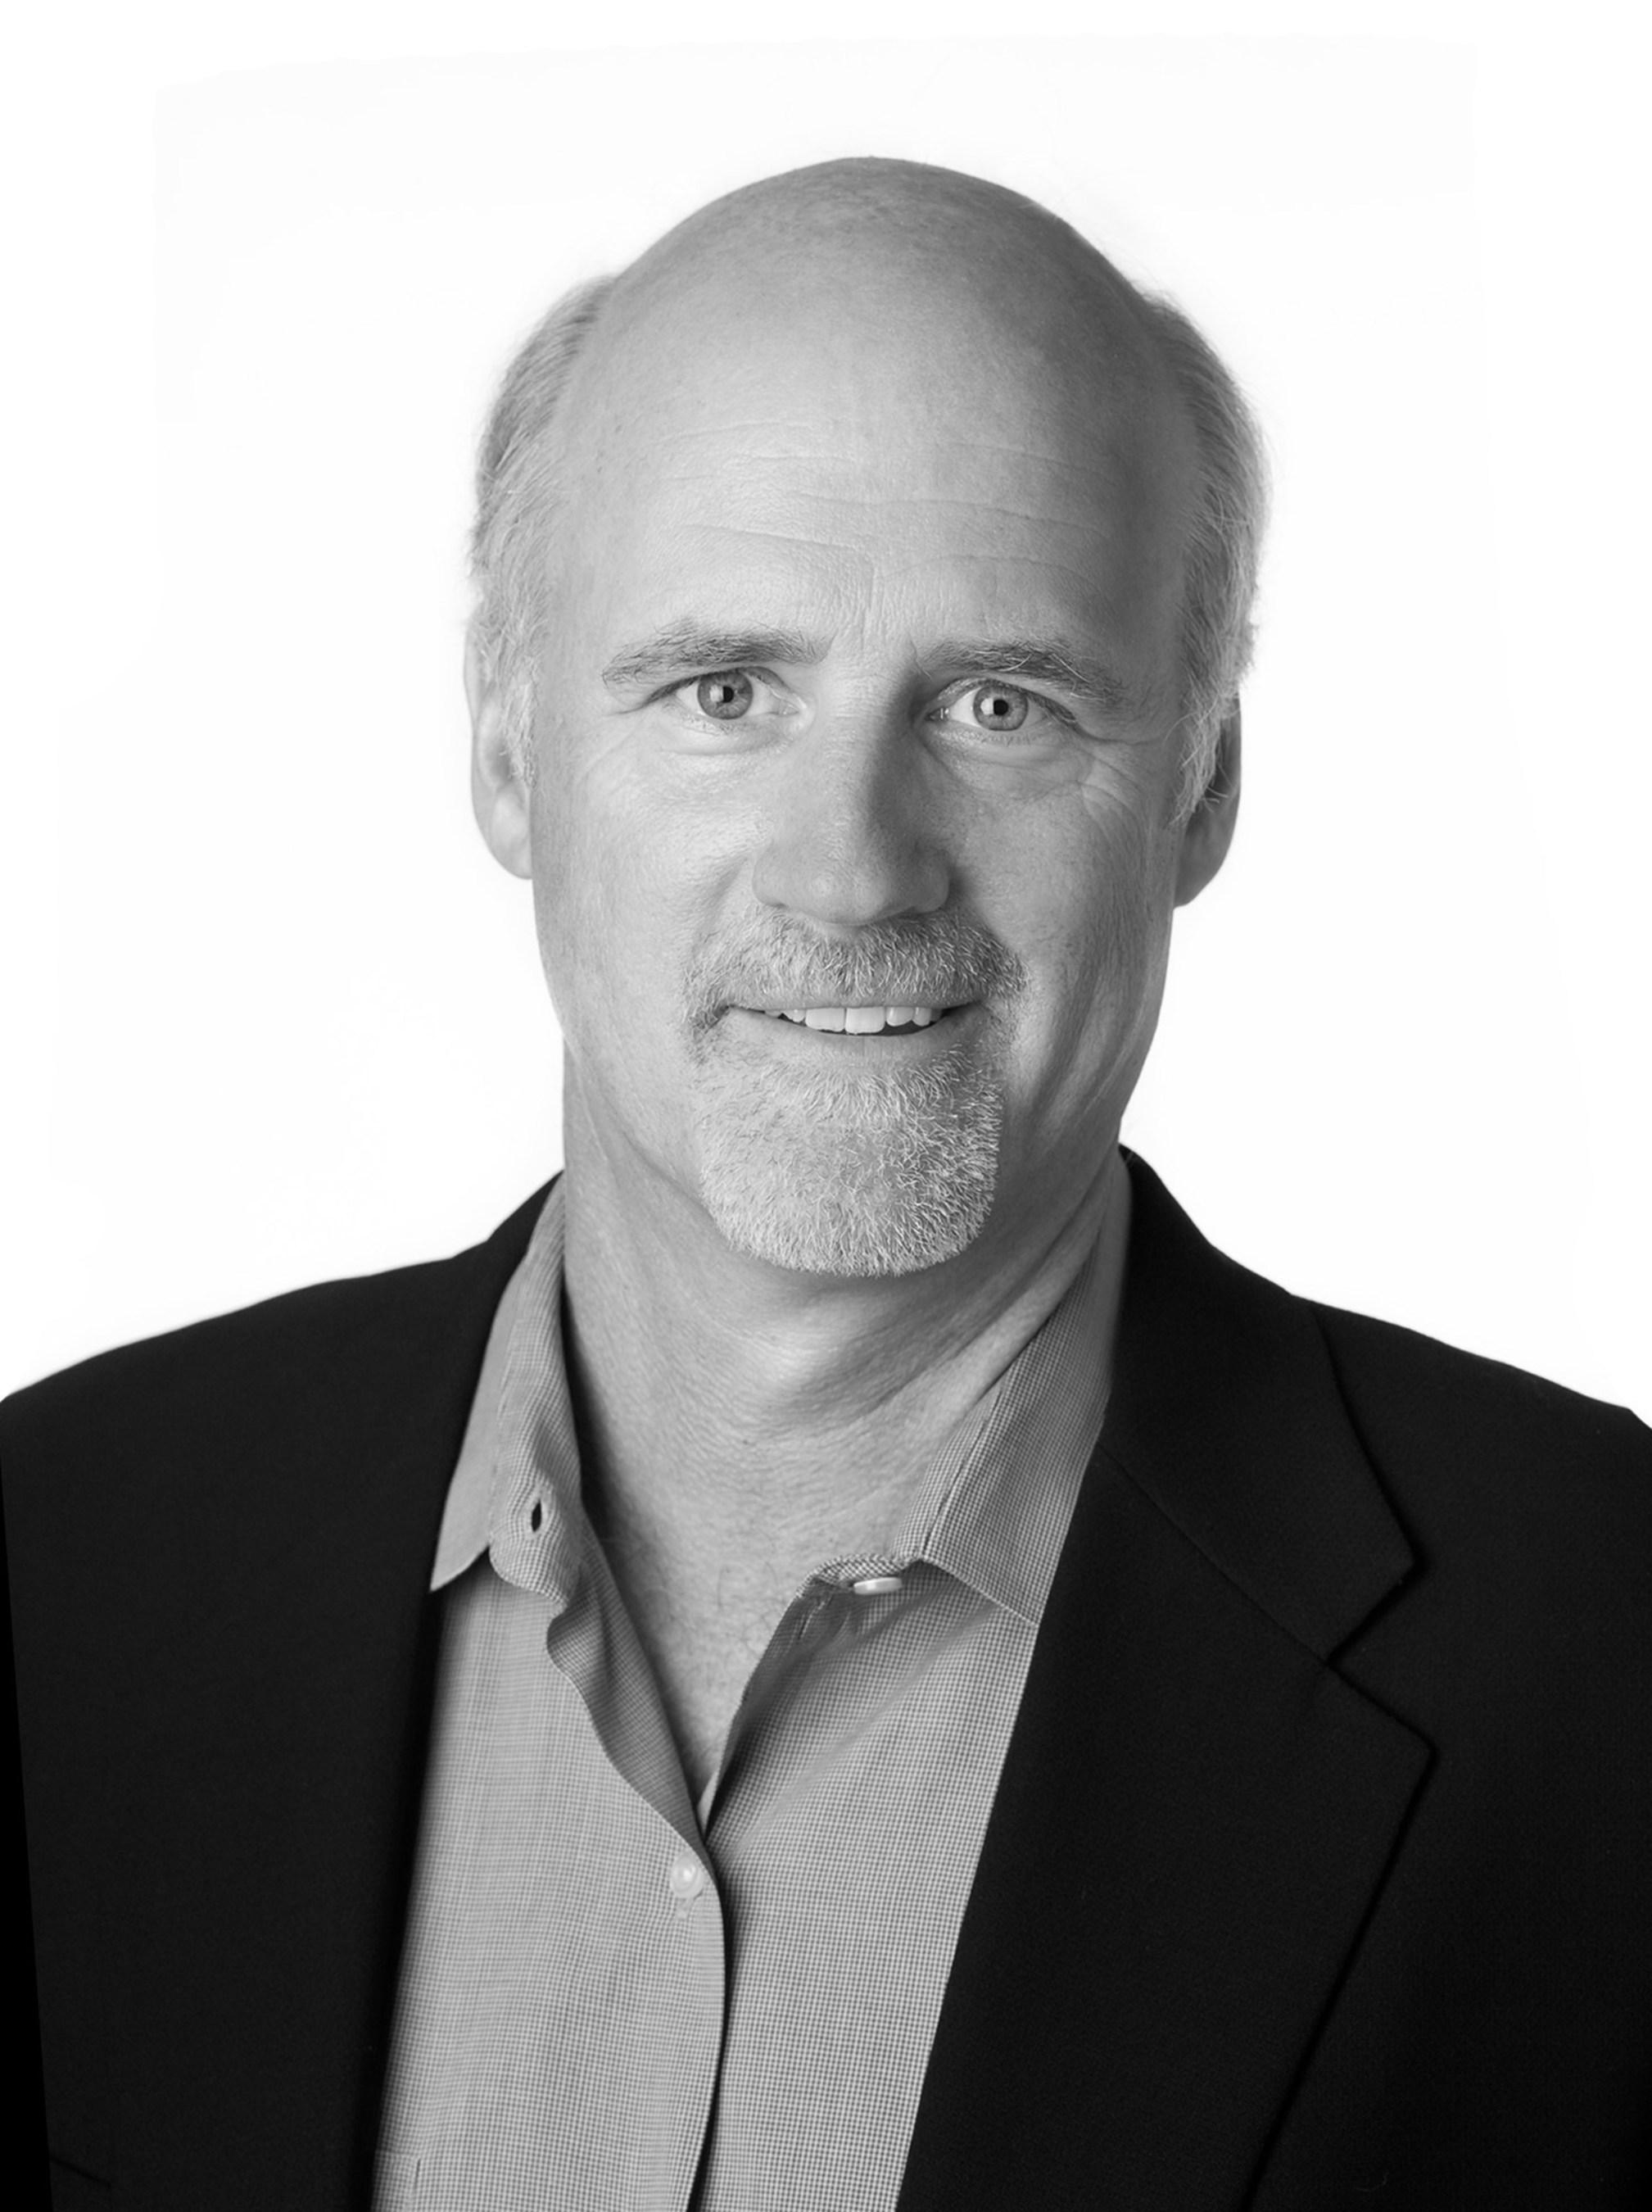 Kellogg (Kelly) L. Warner, President, Advanced Microgrid Solutions